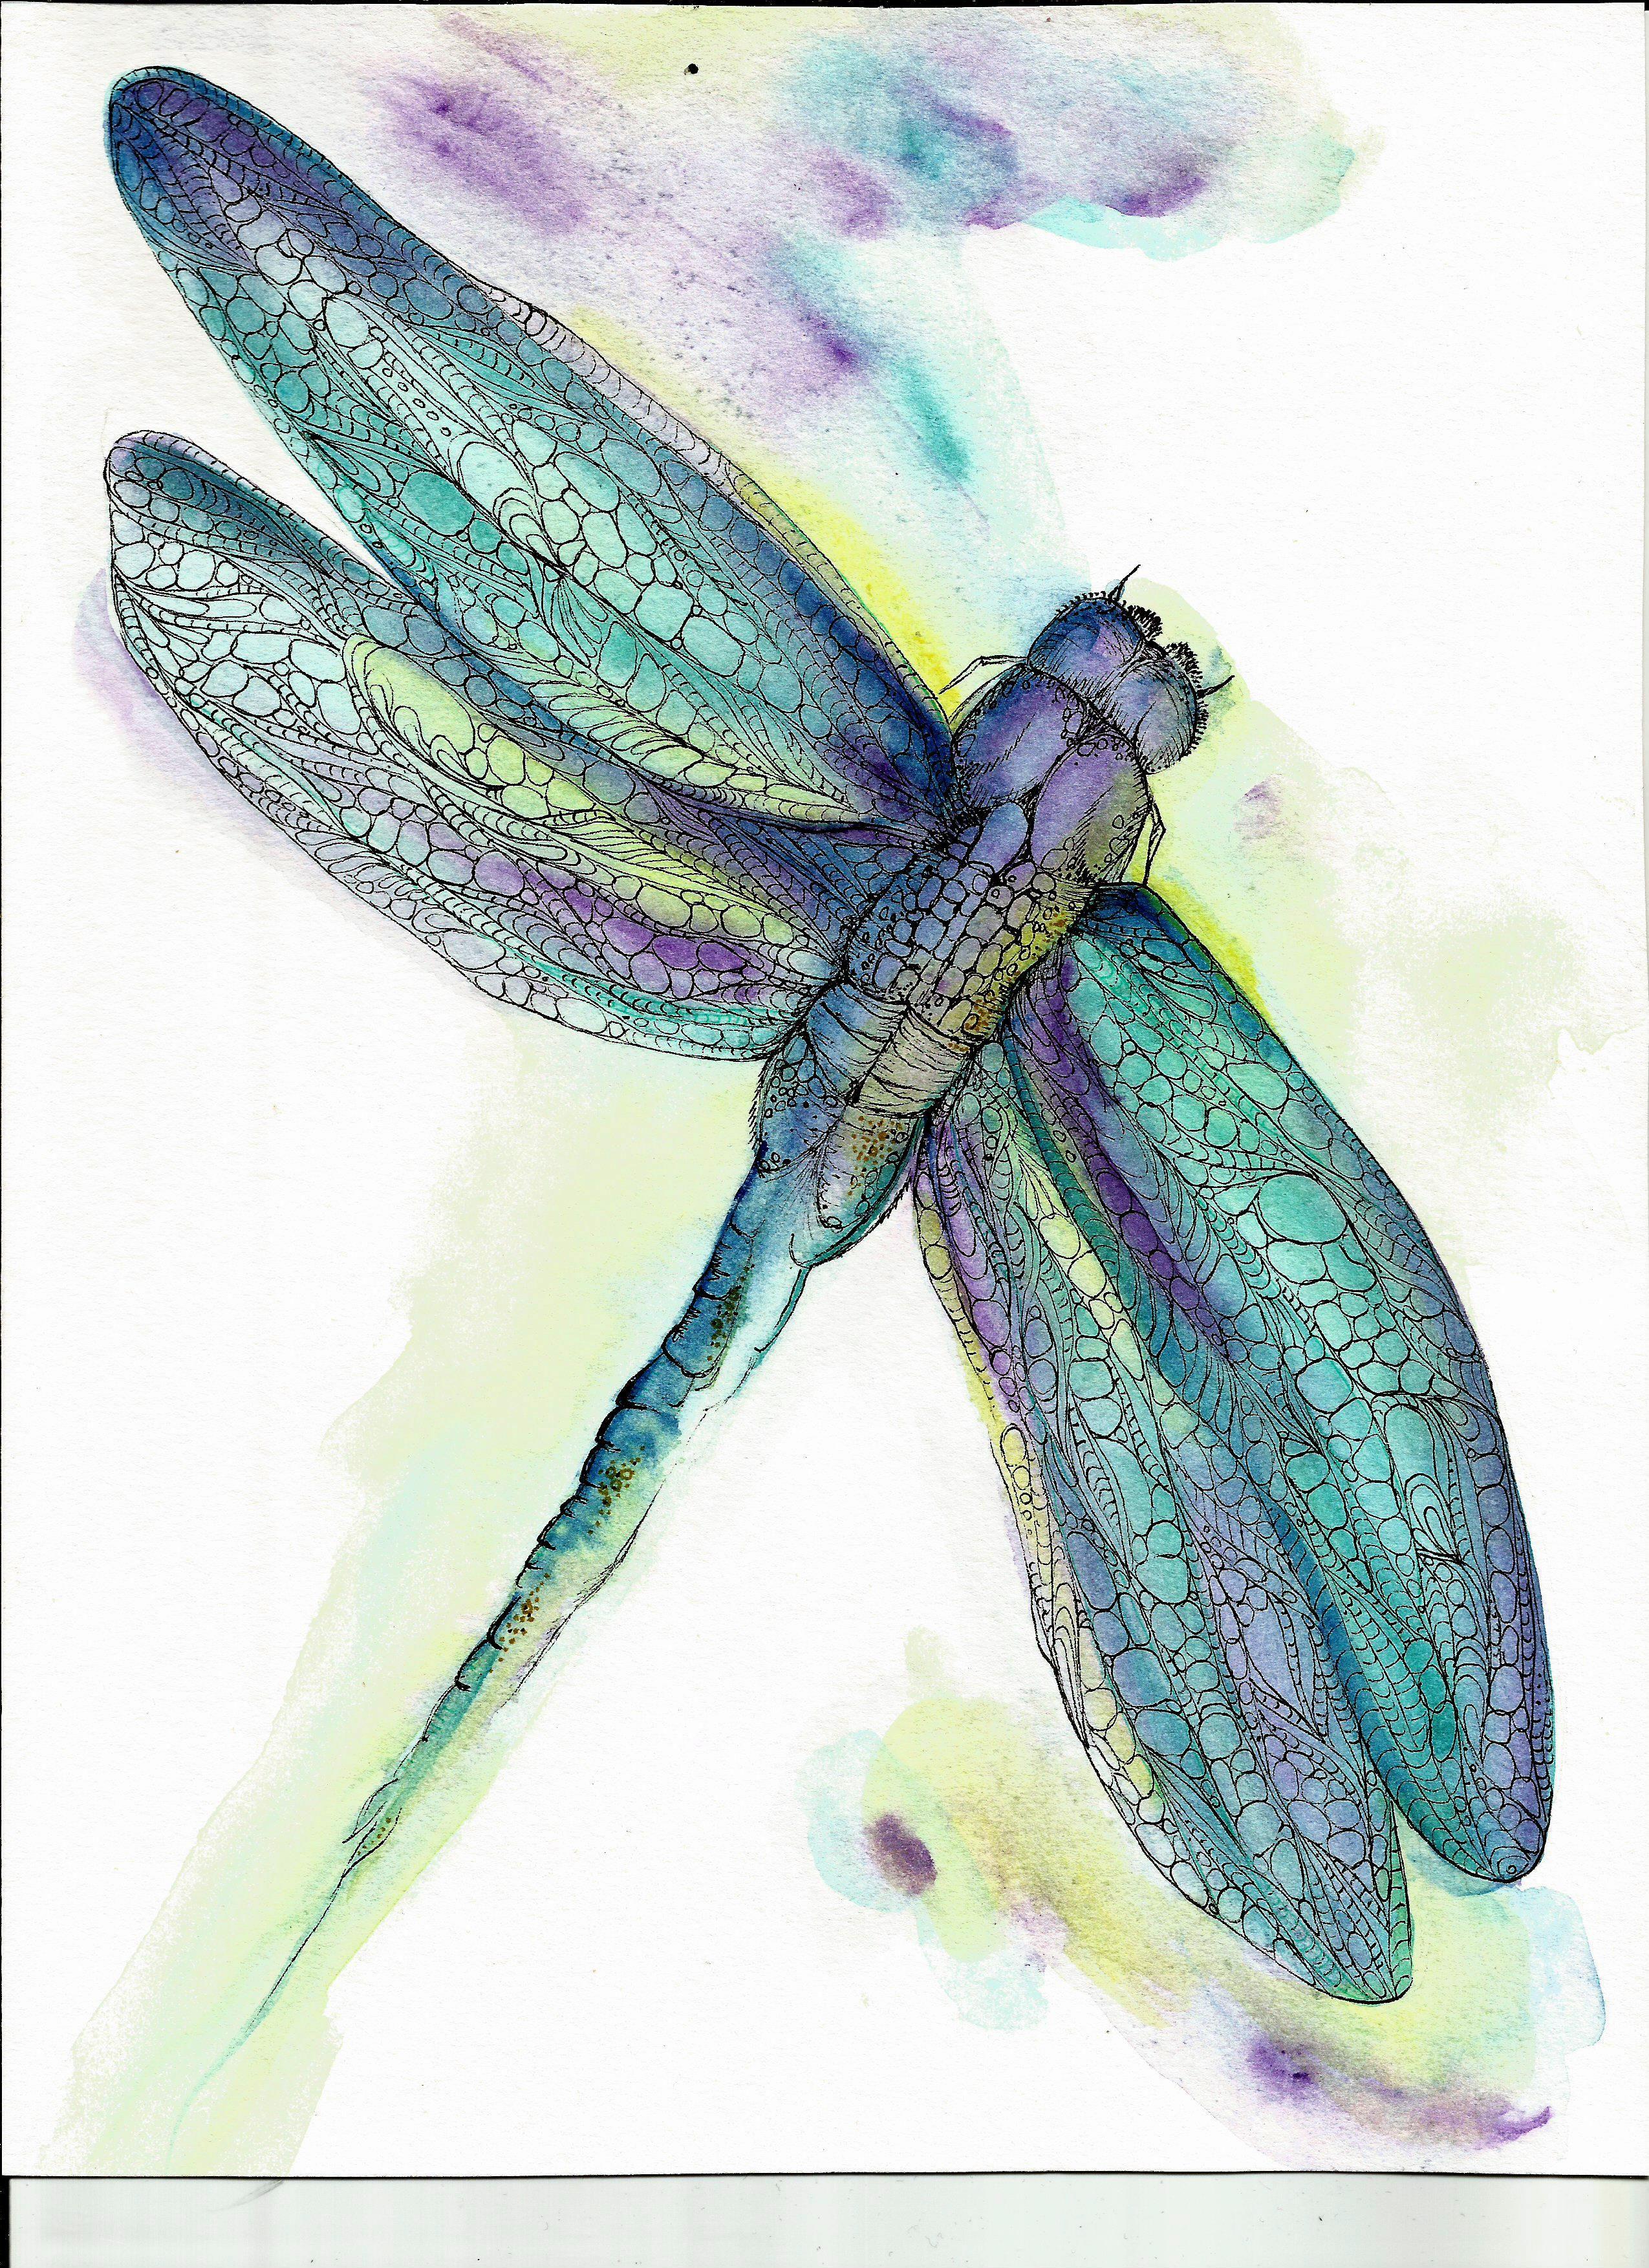 Watercolors Dragonfly Art Print | ART - Watercolor | Pinterest ...